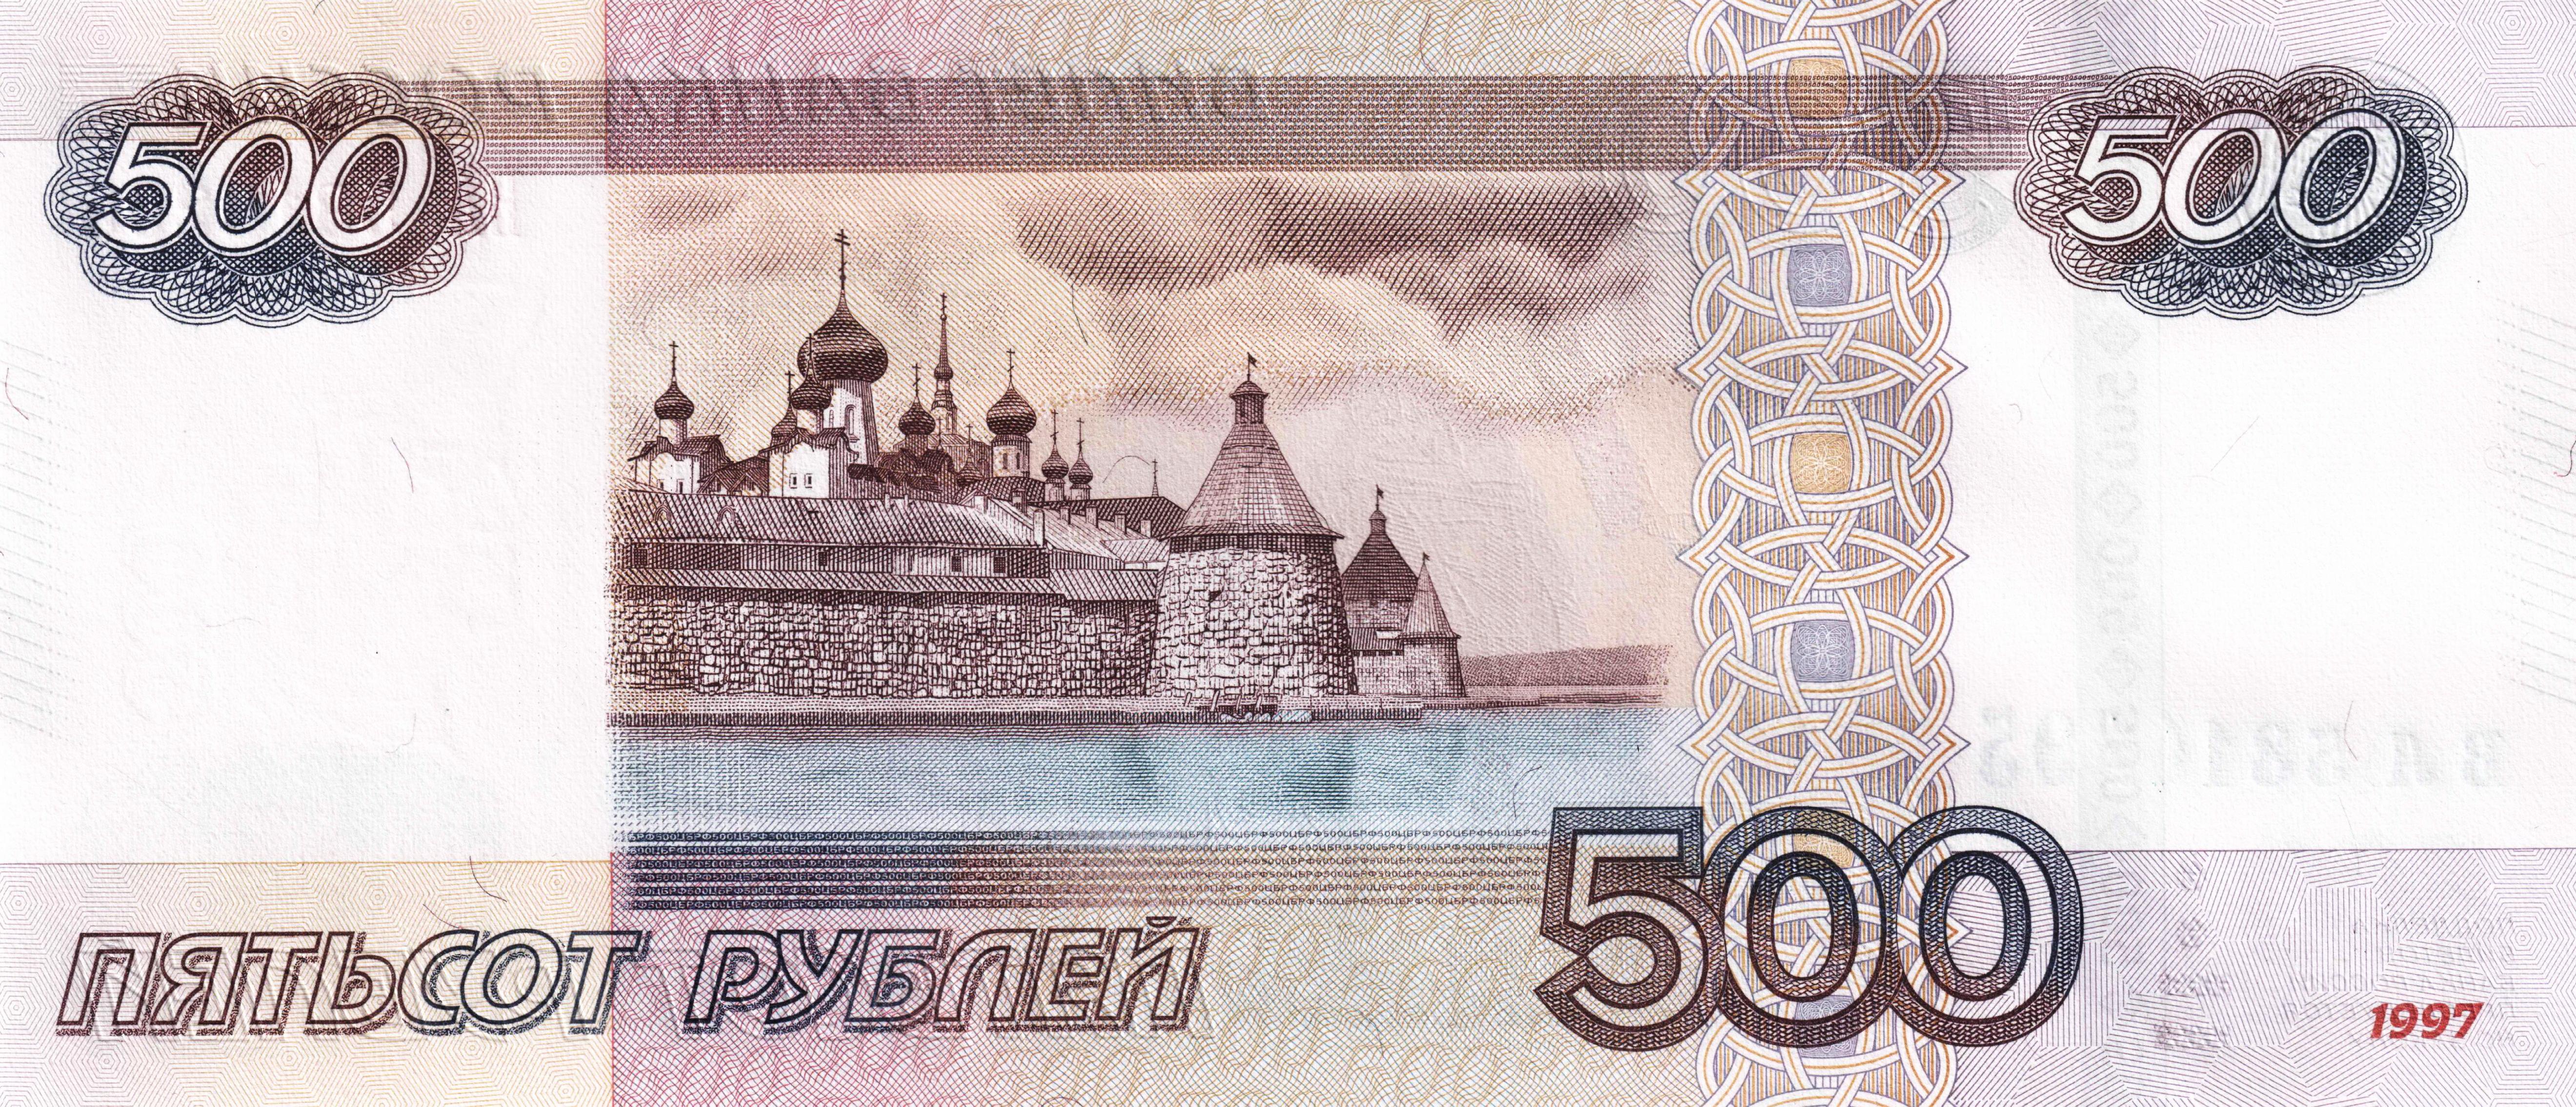 http://upload.wikimedia.org/wikipedia/commons/7/78/Banknote_500_rubles_2010_back.jpg